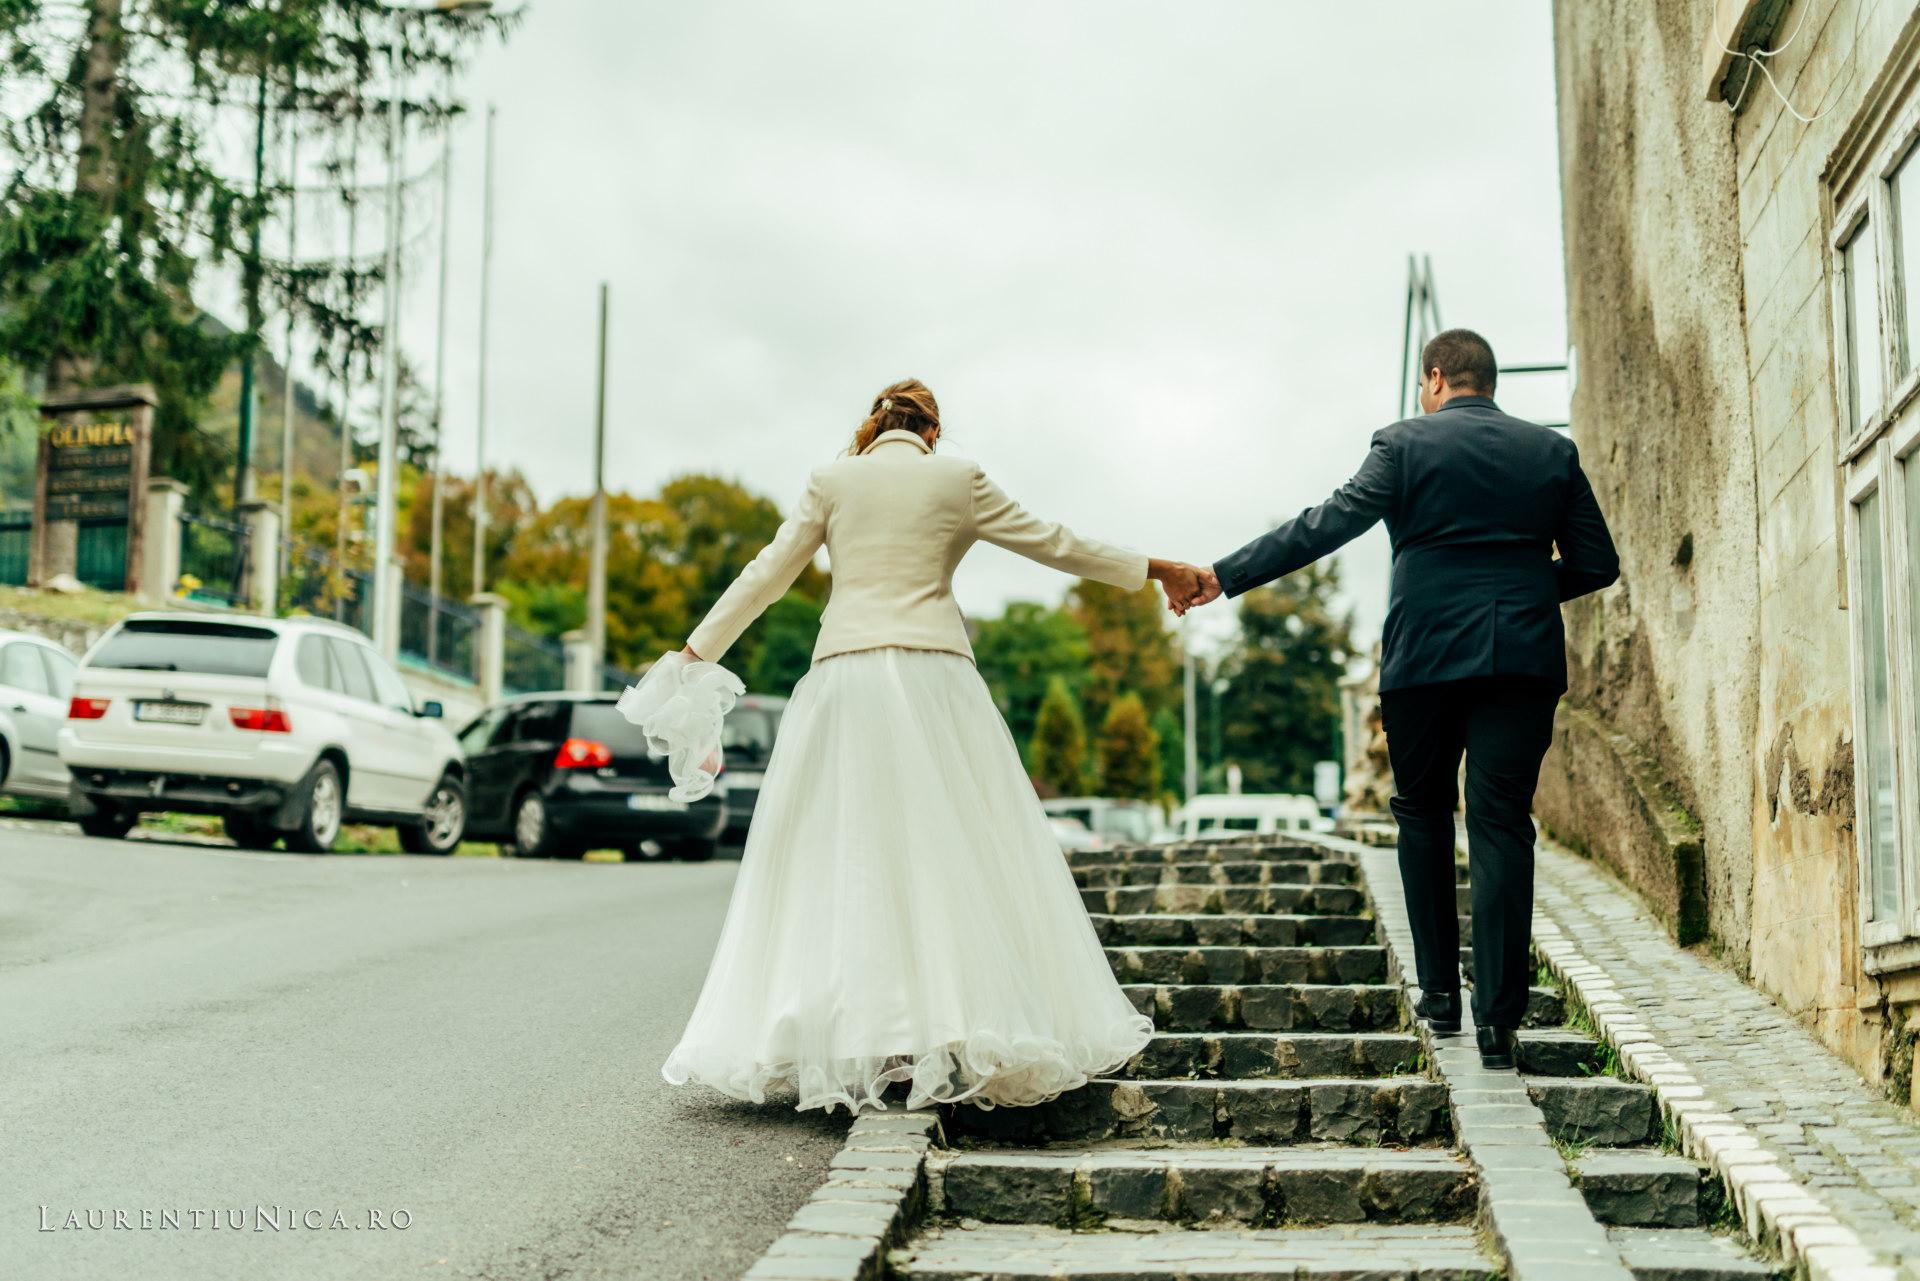 iulia-si-cosmin-fotografii-after-wedding-brasov-laurentiu-nica19